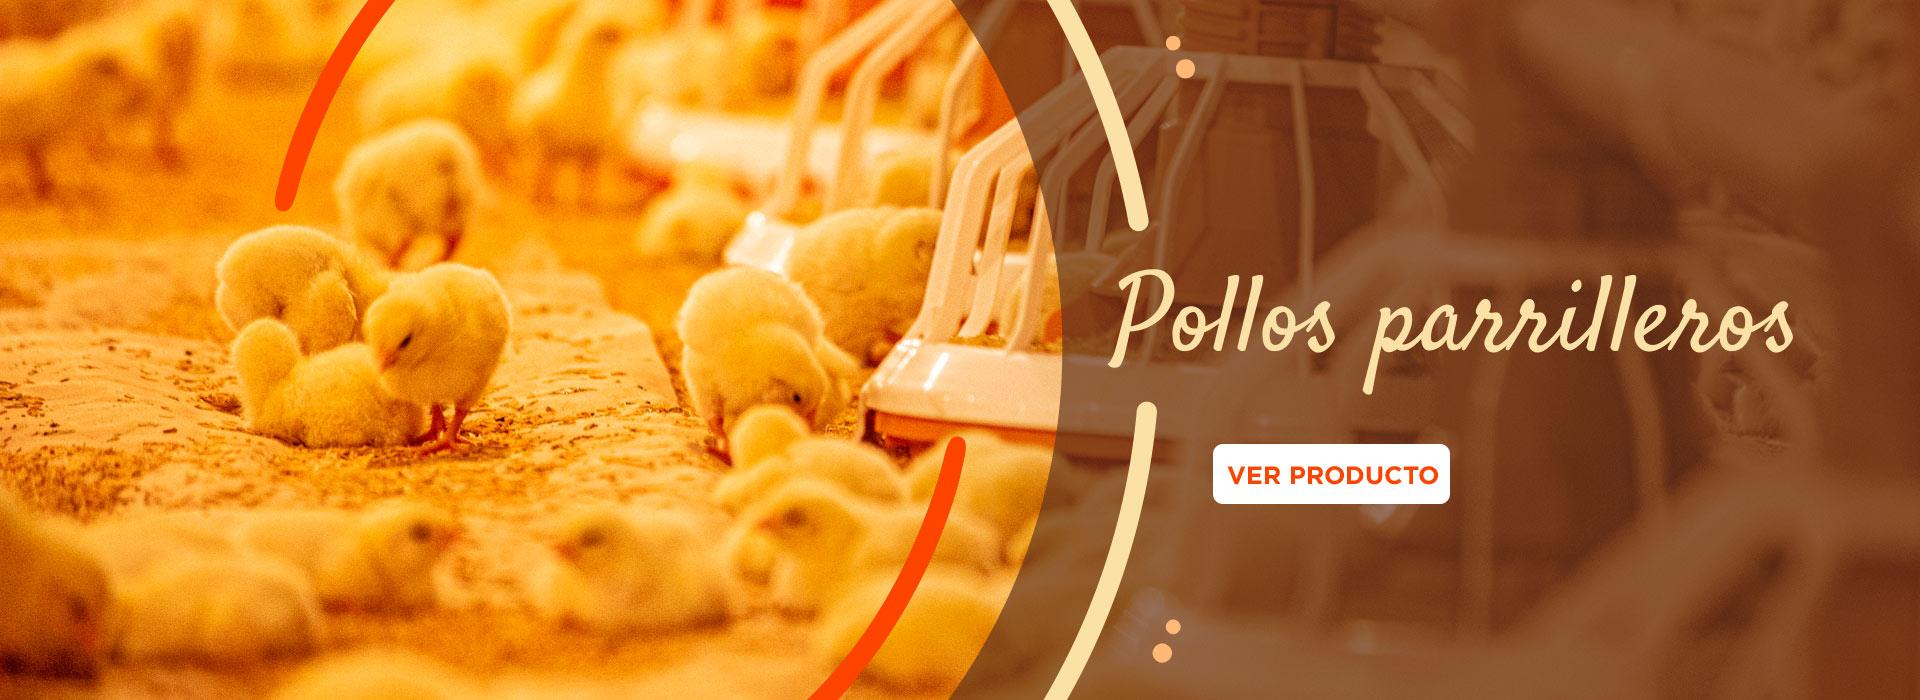 CyB-Slides-Pollos